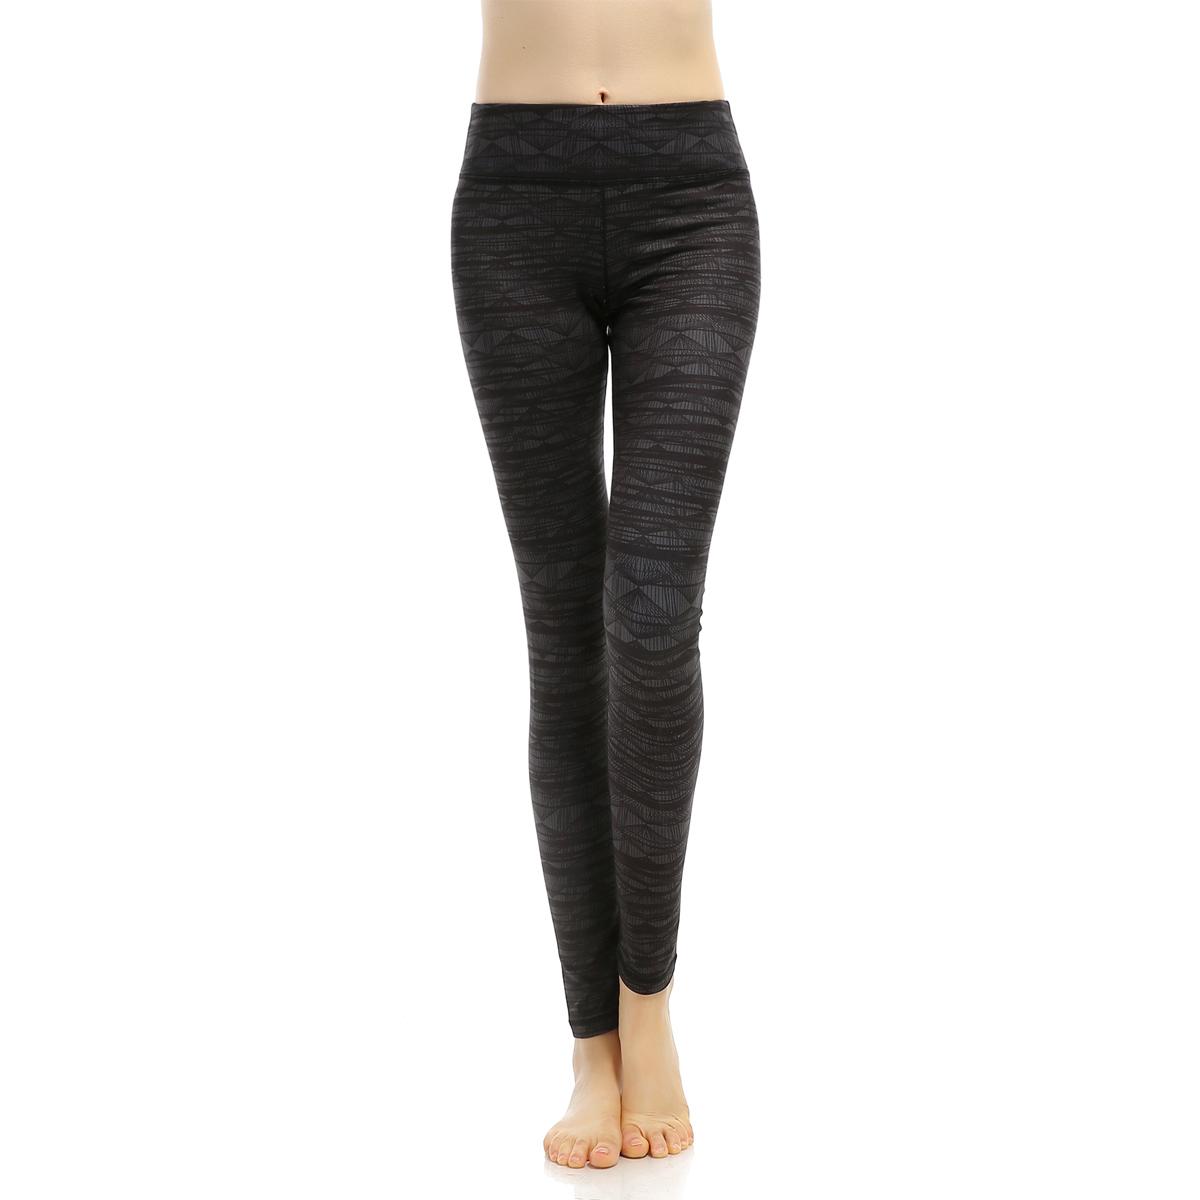 Breathable seamless yoga pants womens compression yoga pants